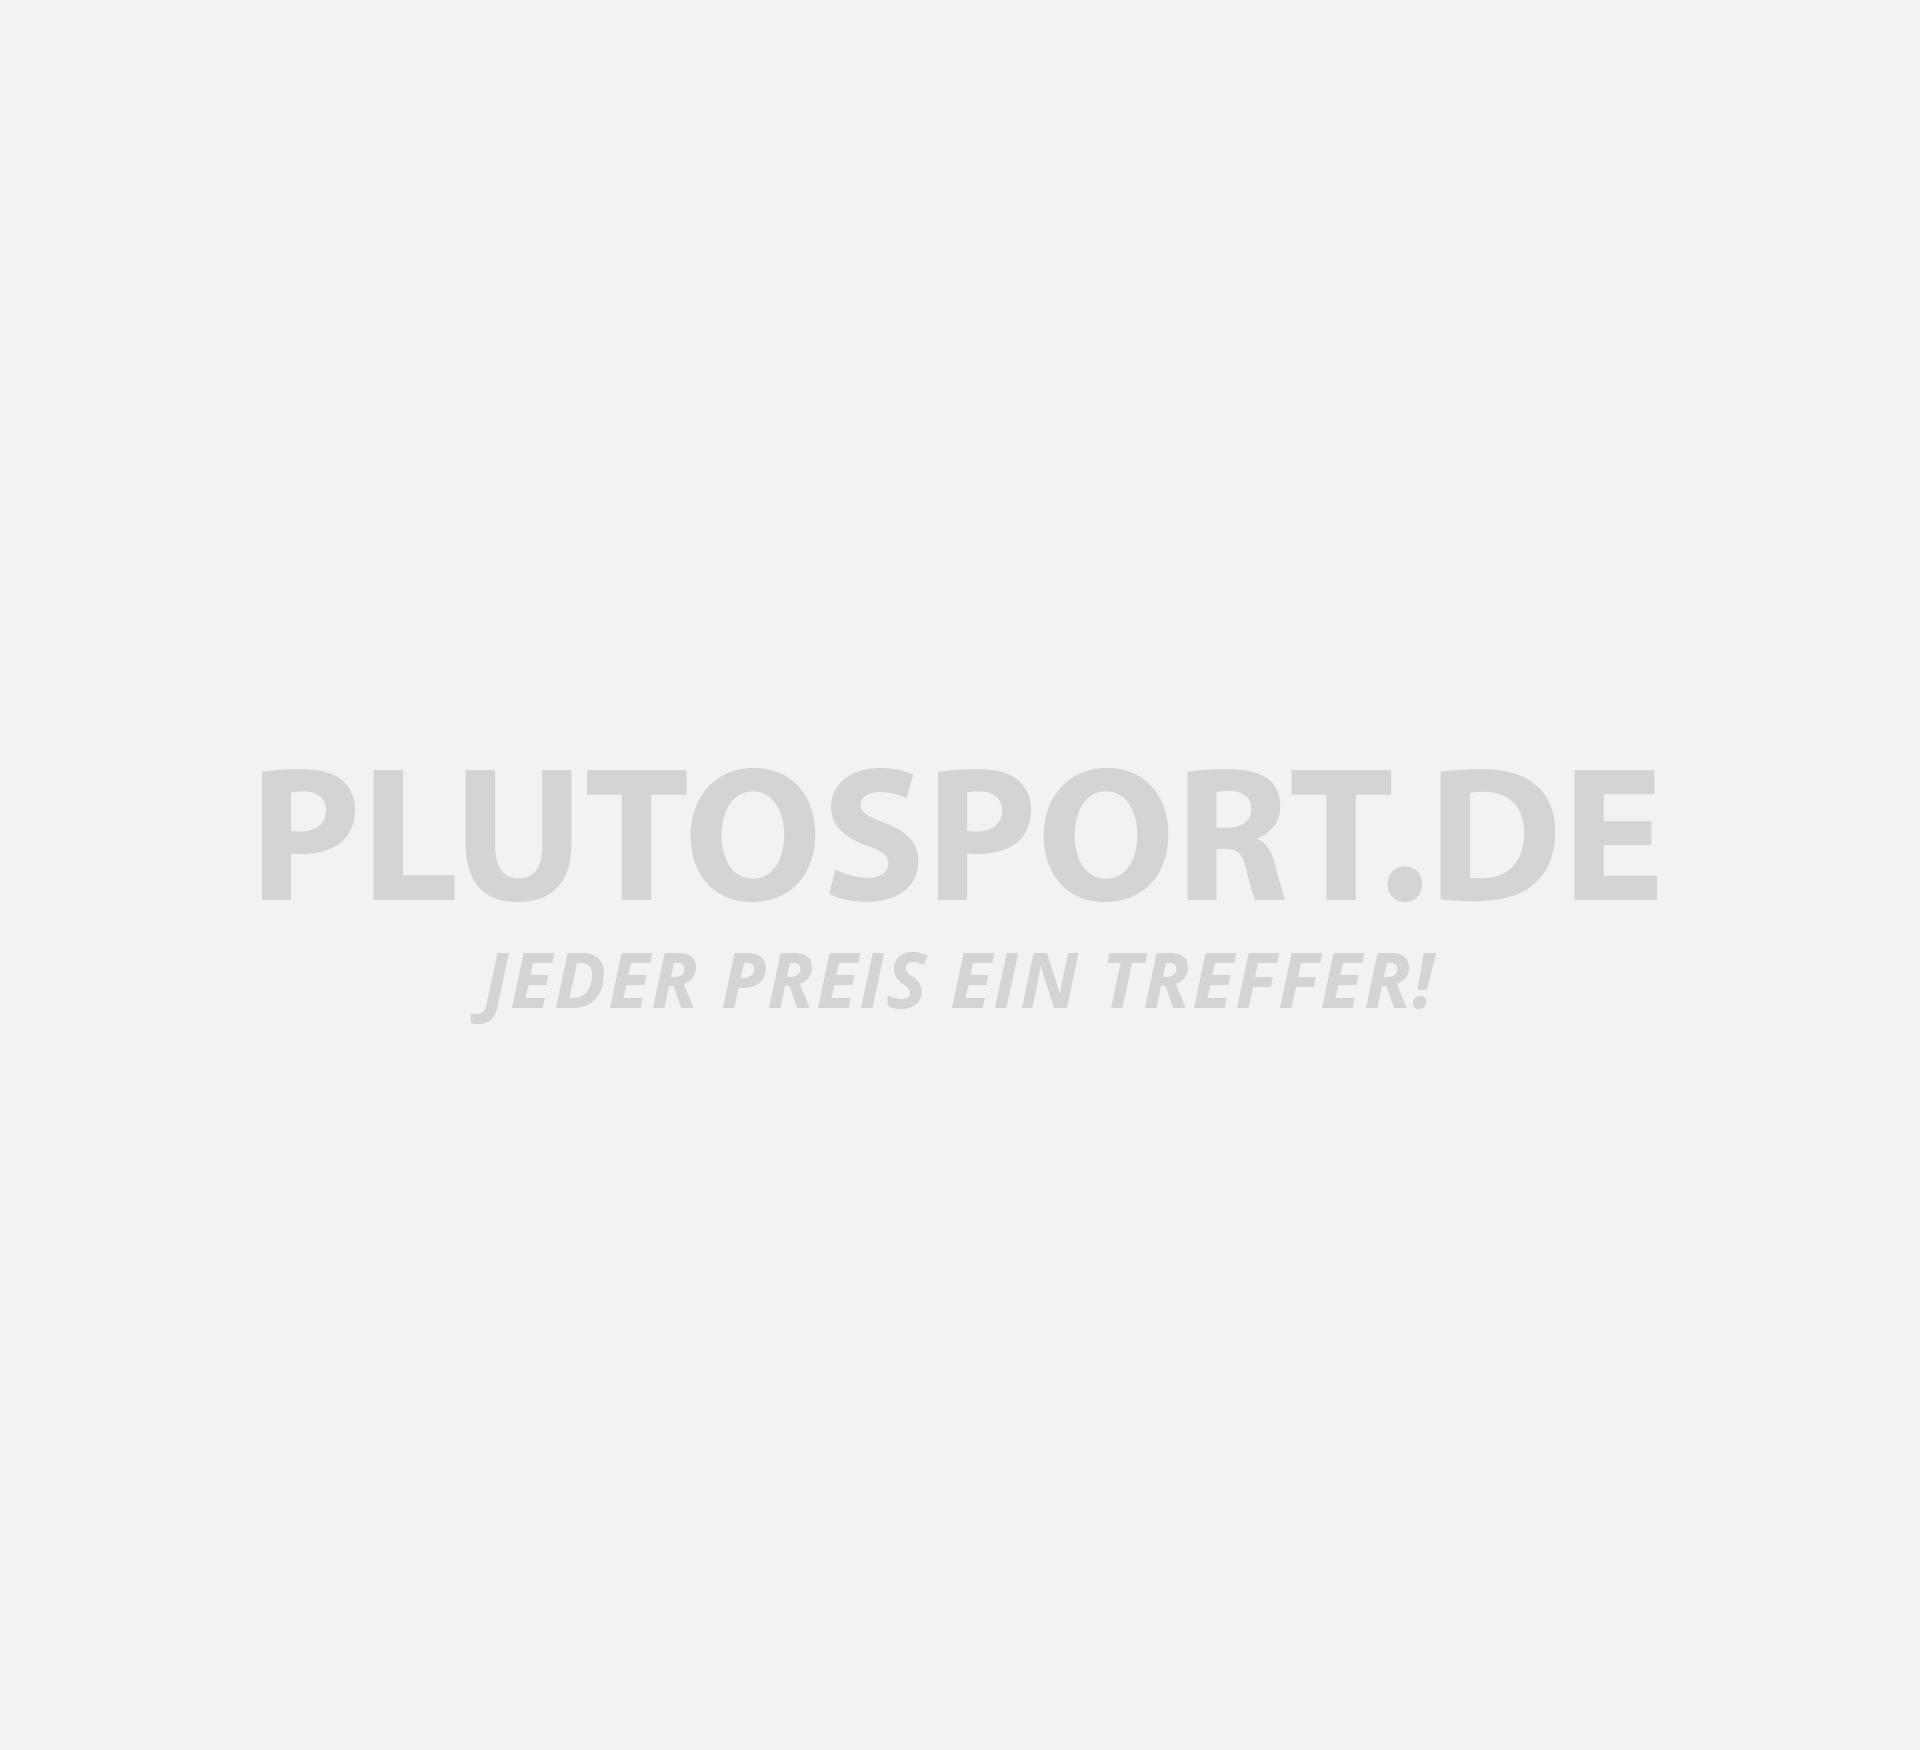 Asics Gel-Blackheath 4 Hockeyschuh Herren